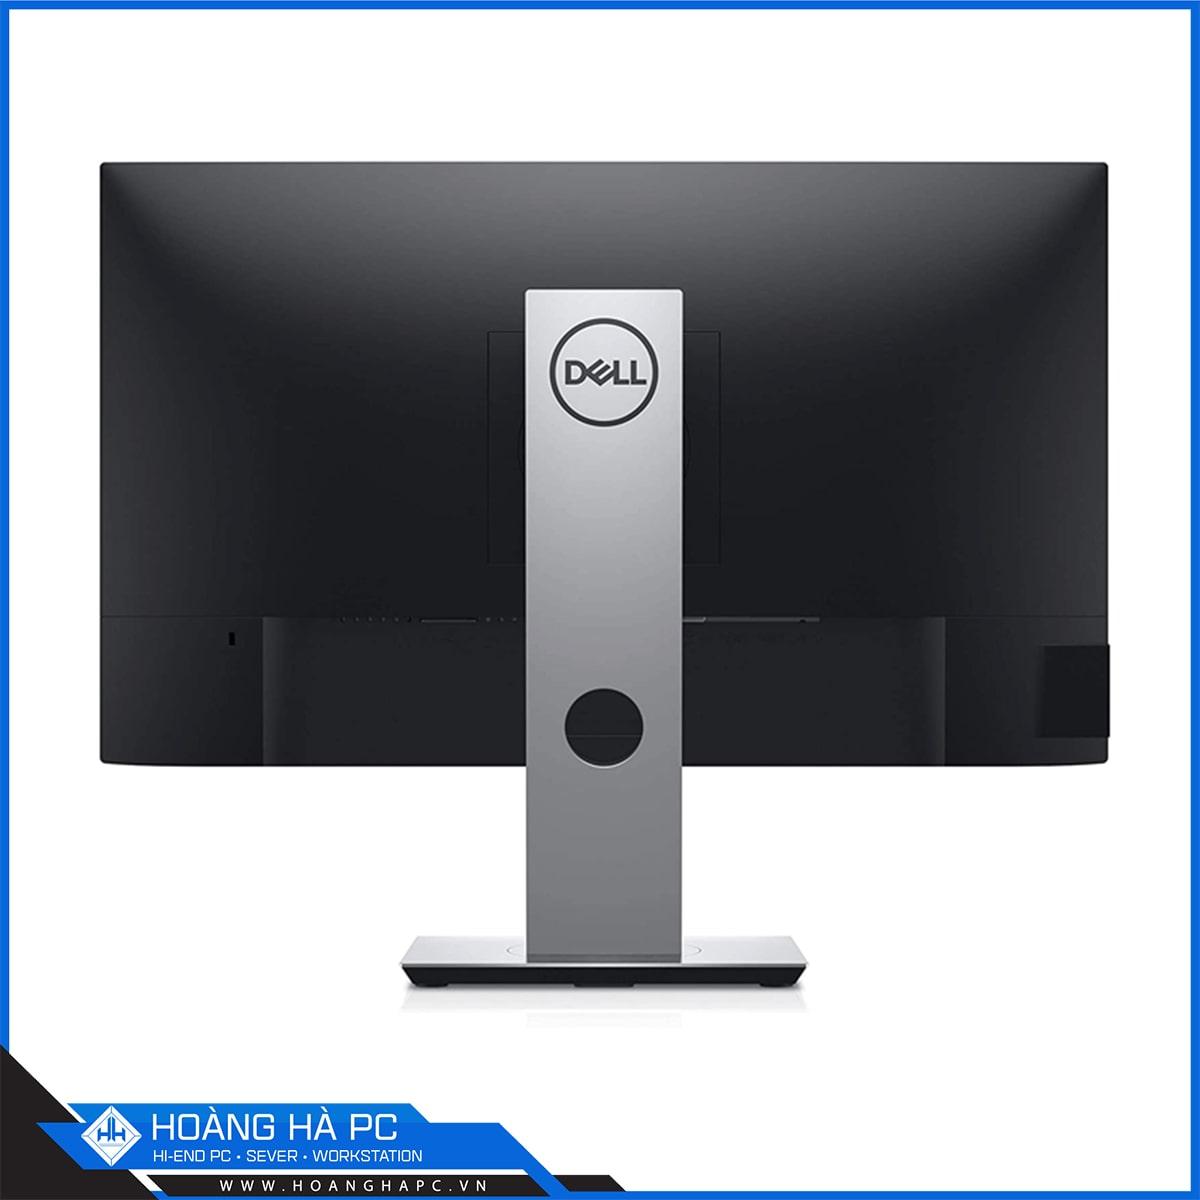 Dell P2219H 21.5 Inch IPS